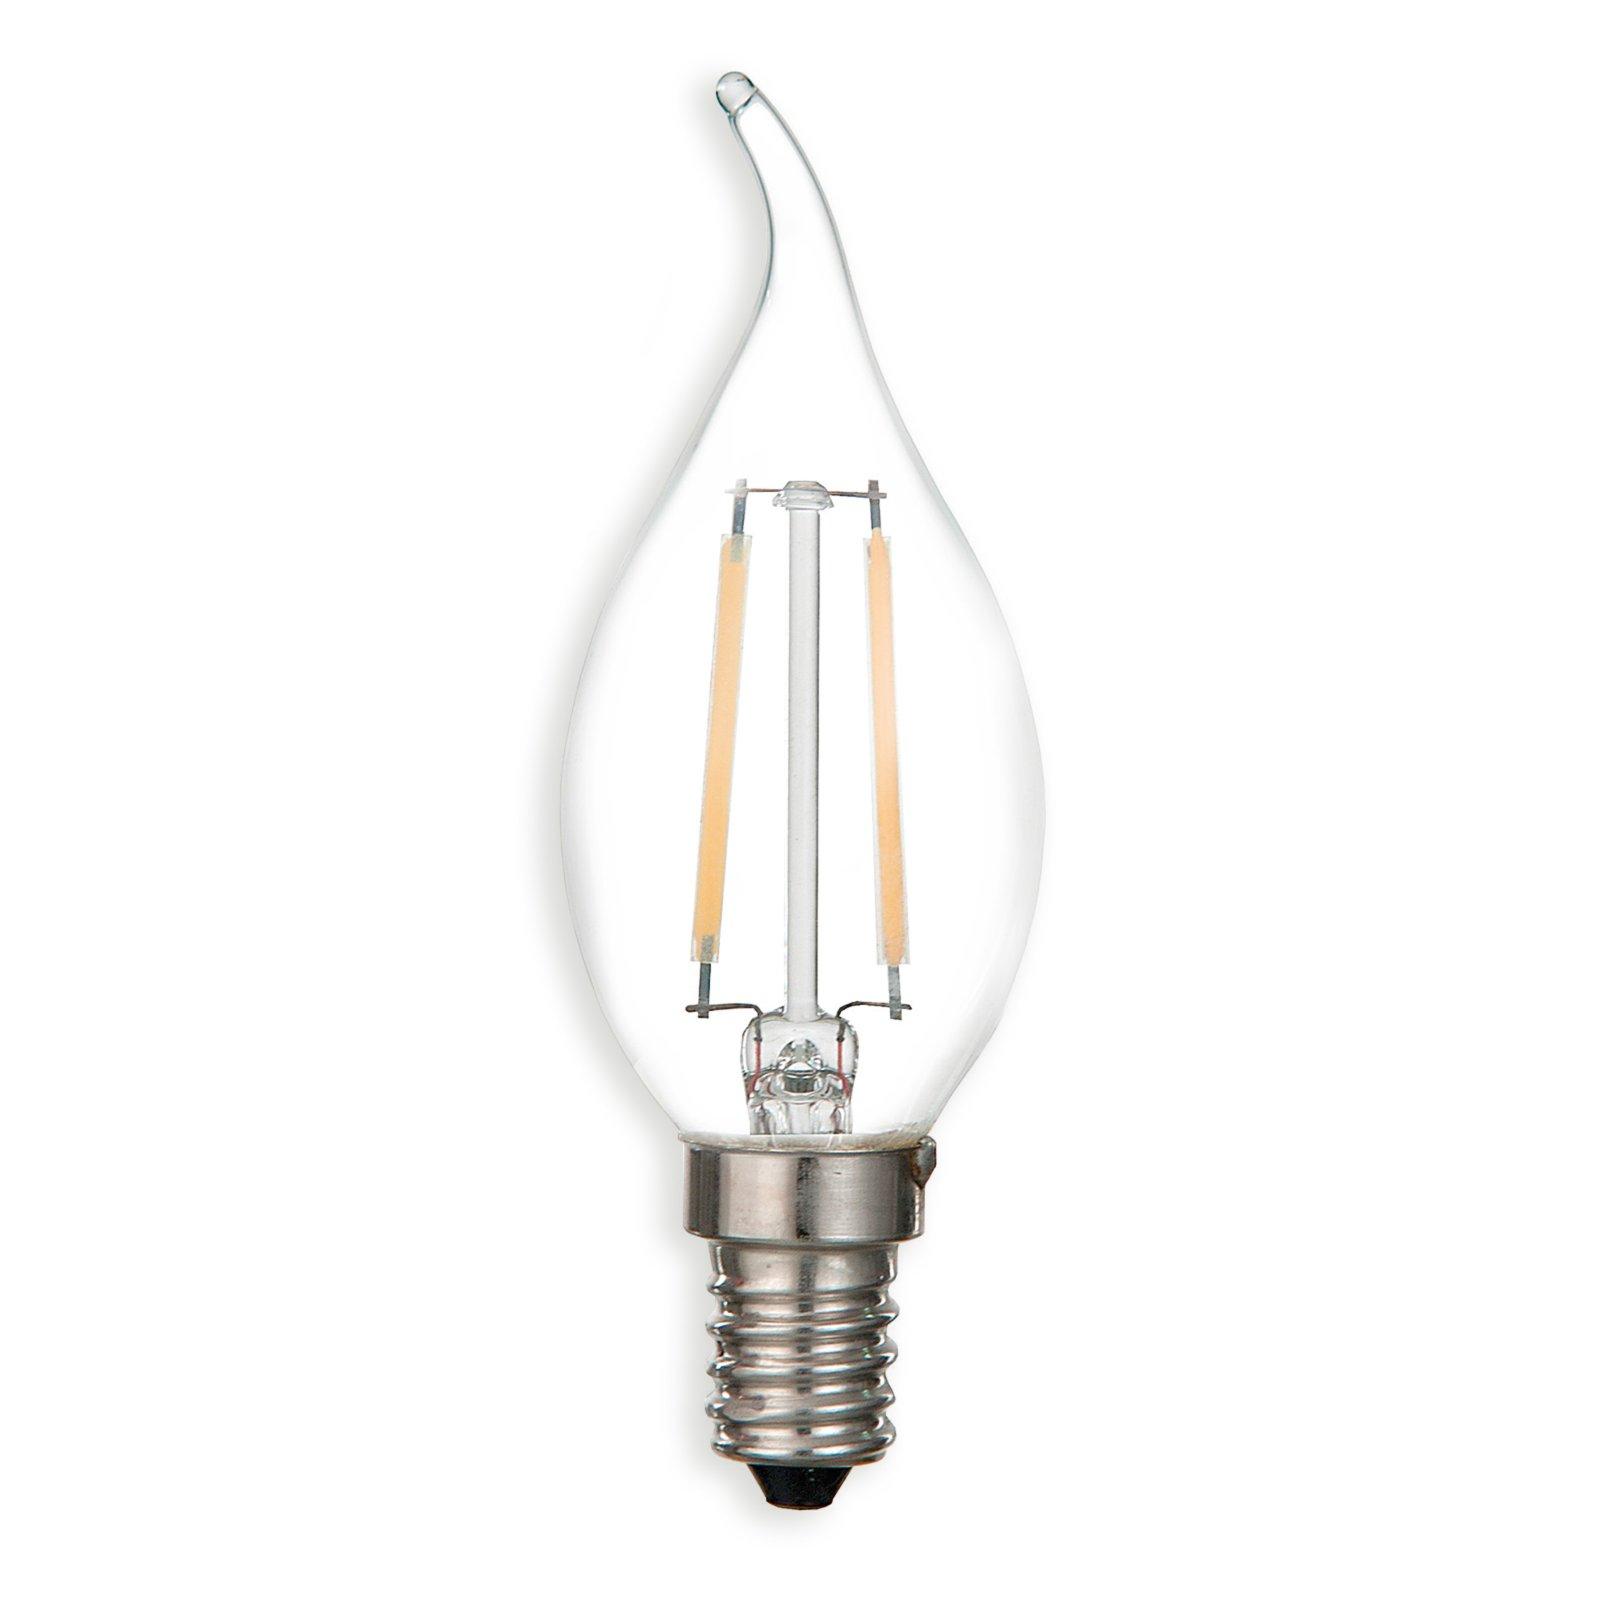 led windsto kerze filament e14 2 watt warmwei led leuchtmittel leuchtmittel. Black Bedroom Furniture Sets. Home Design Ideas